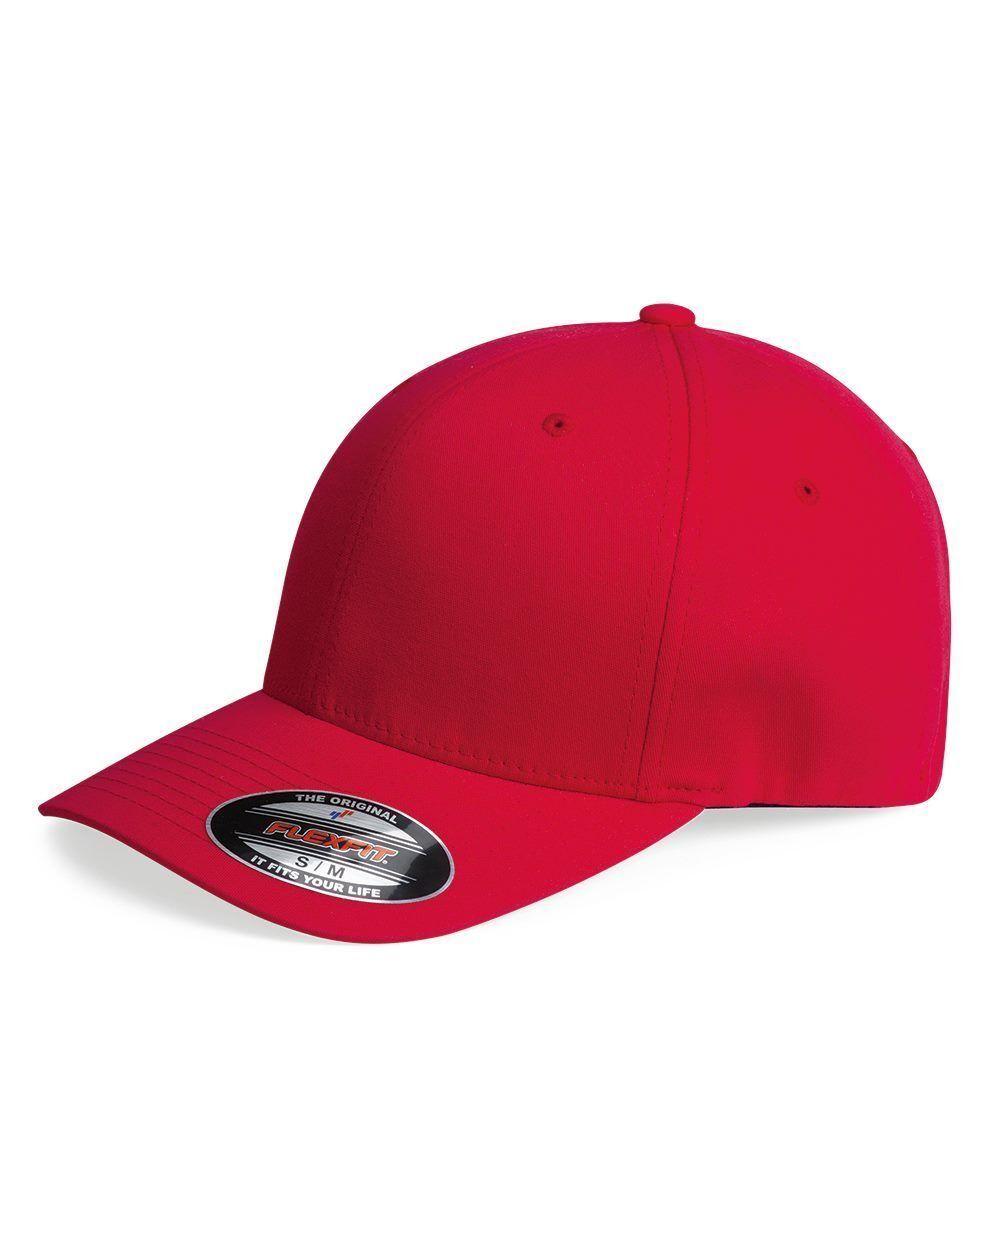 19e3be5db61 Flexfit V-Flexfit Cotton Twill Fitted Baseball Blank Plain Hat Cap 5001 S M  L XL